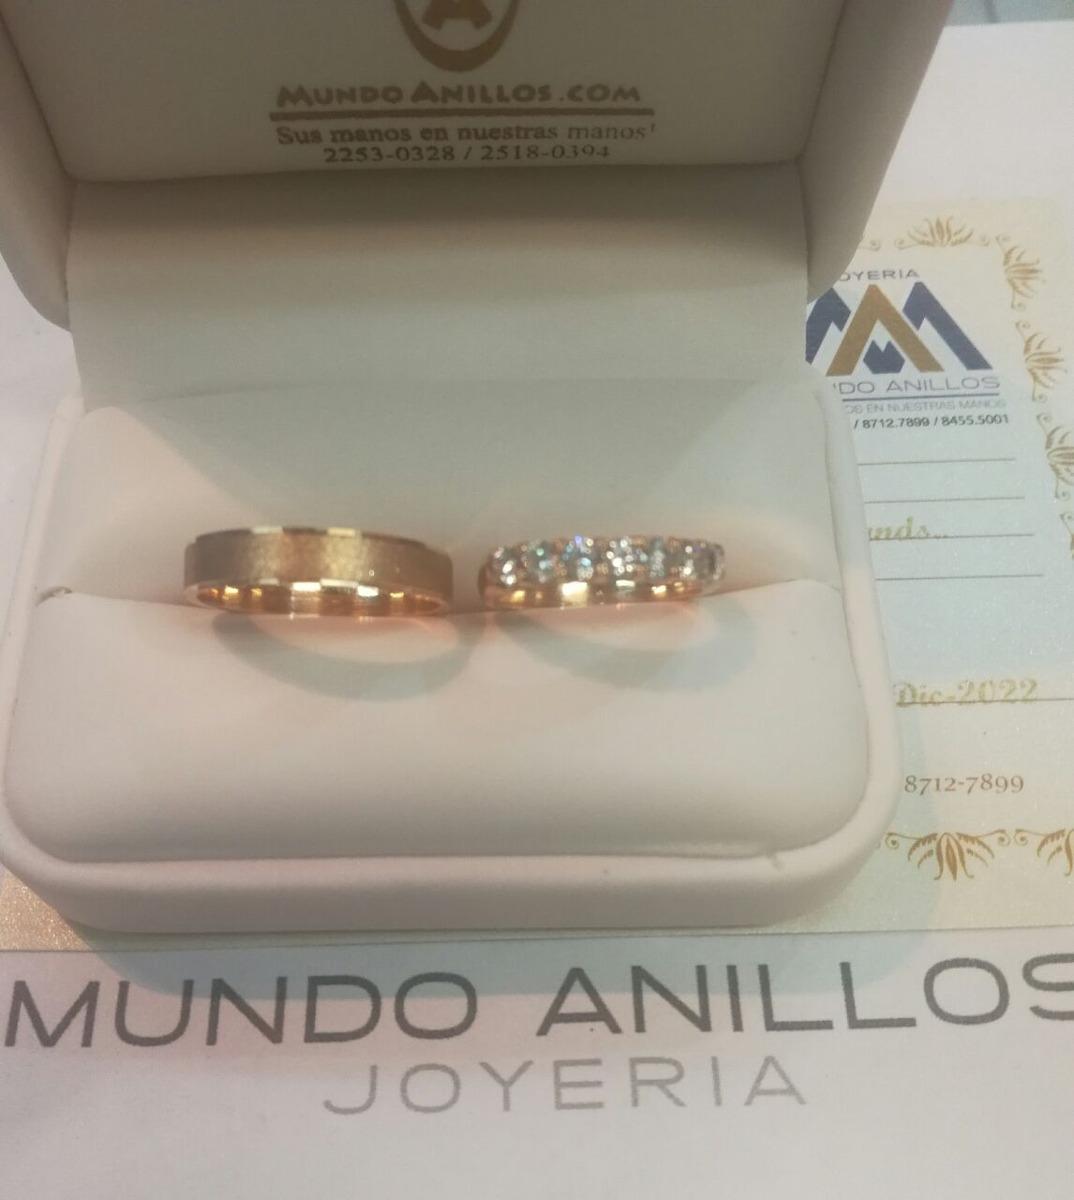 df169a0eb566 joyerias de costa rica anillos de compromiso. Cargando zoom.